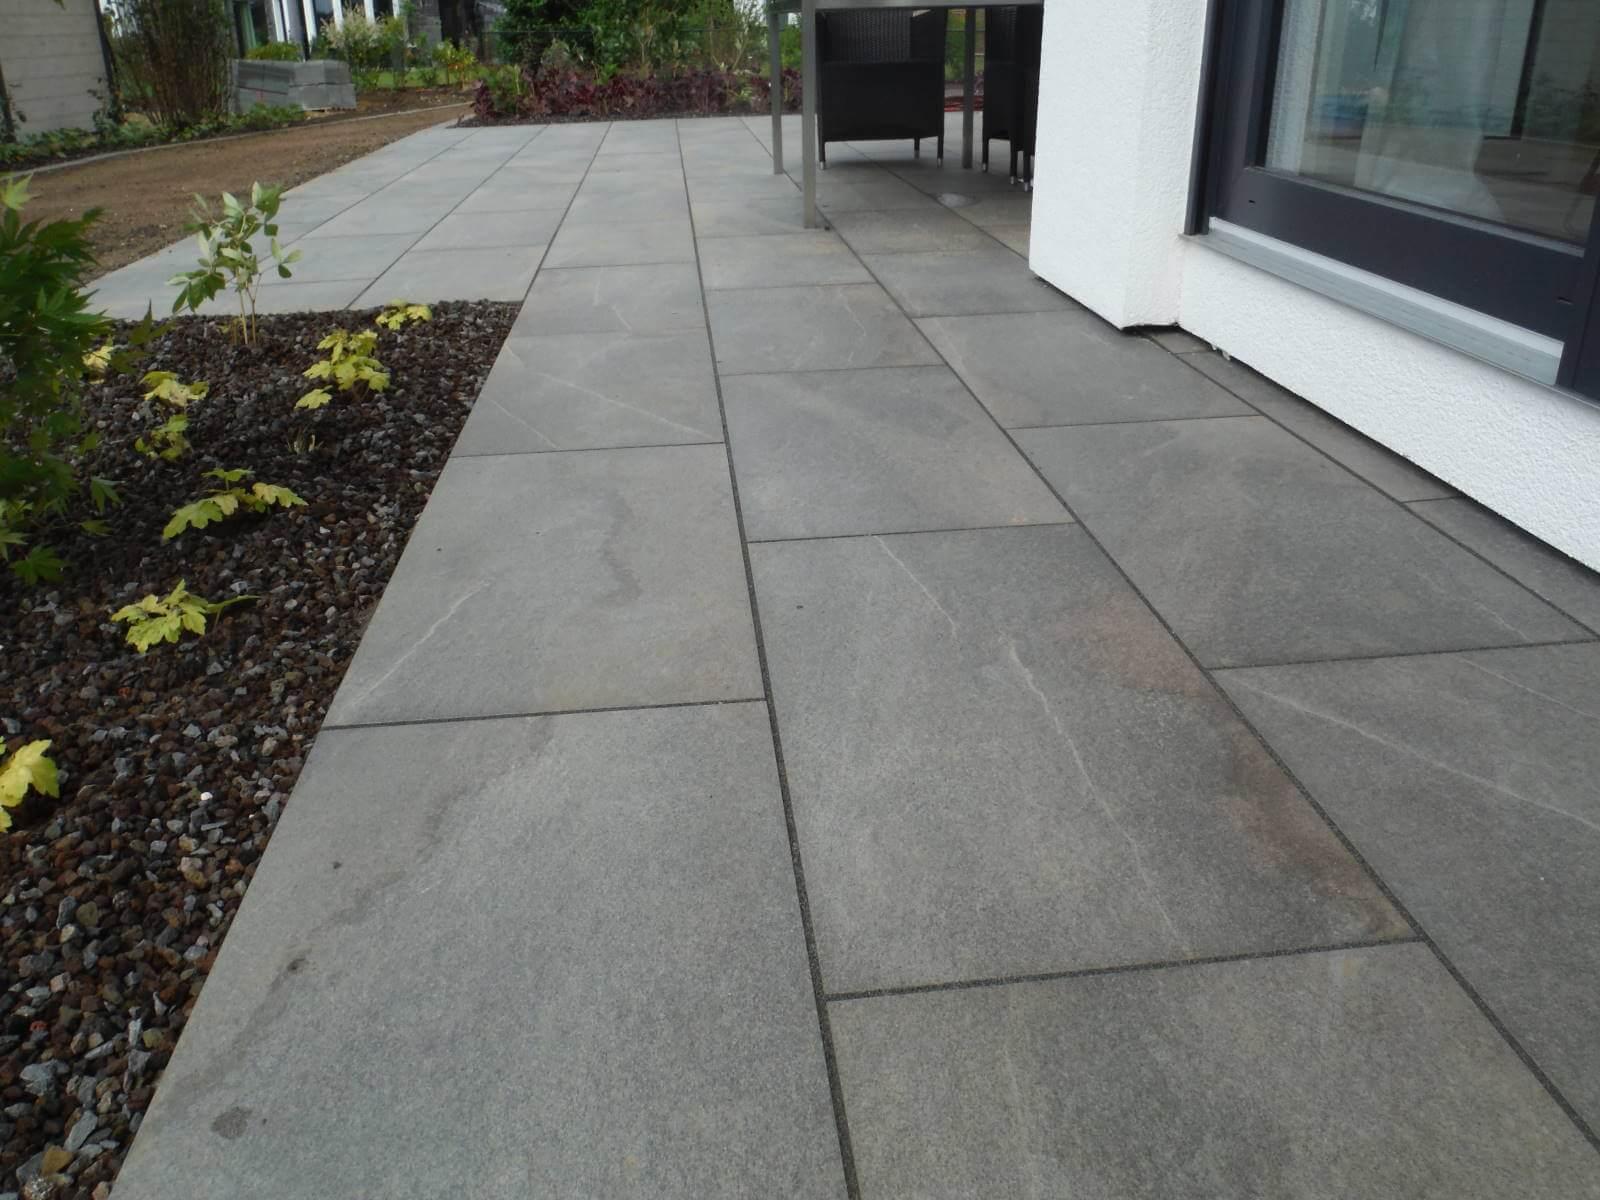 Keramikplatten   Galabau Mähler   Keramikplatten Terrasse